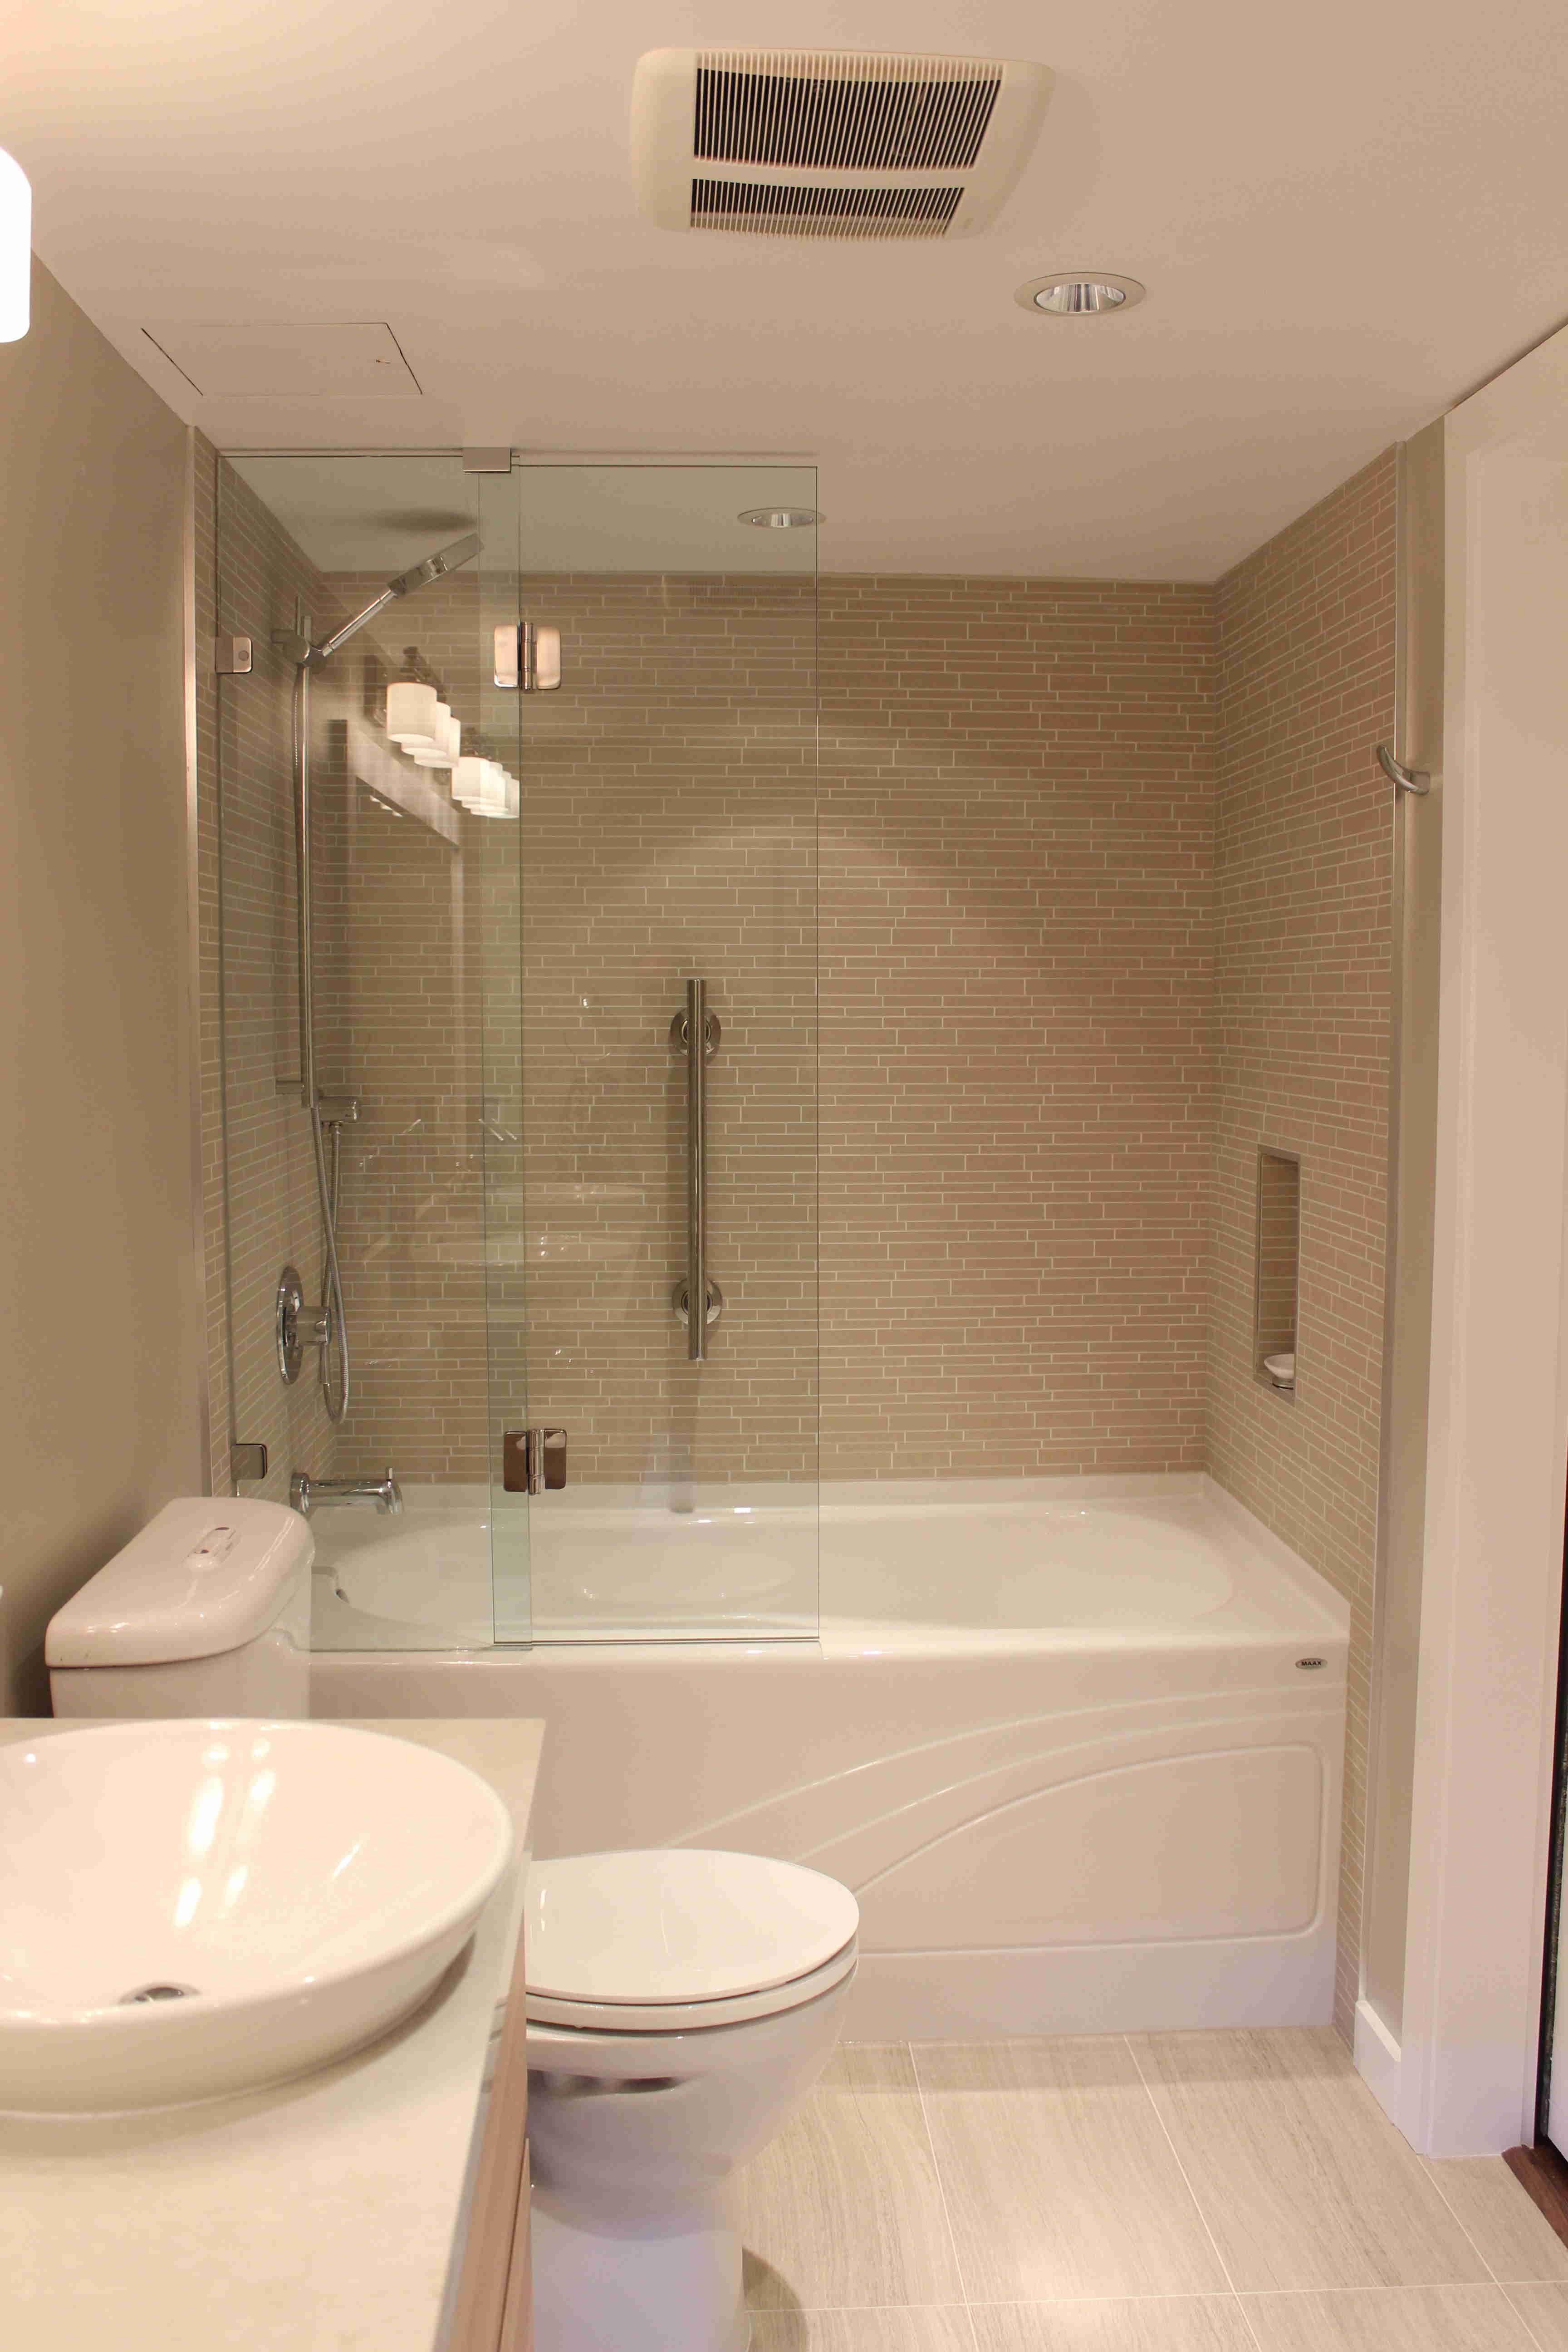 Condo Master Bathroom Remodel Simple And Elegant Full Bathroom Remodel Bathroom Remodel Shower Small Full Bathroom